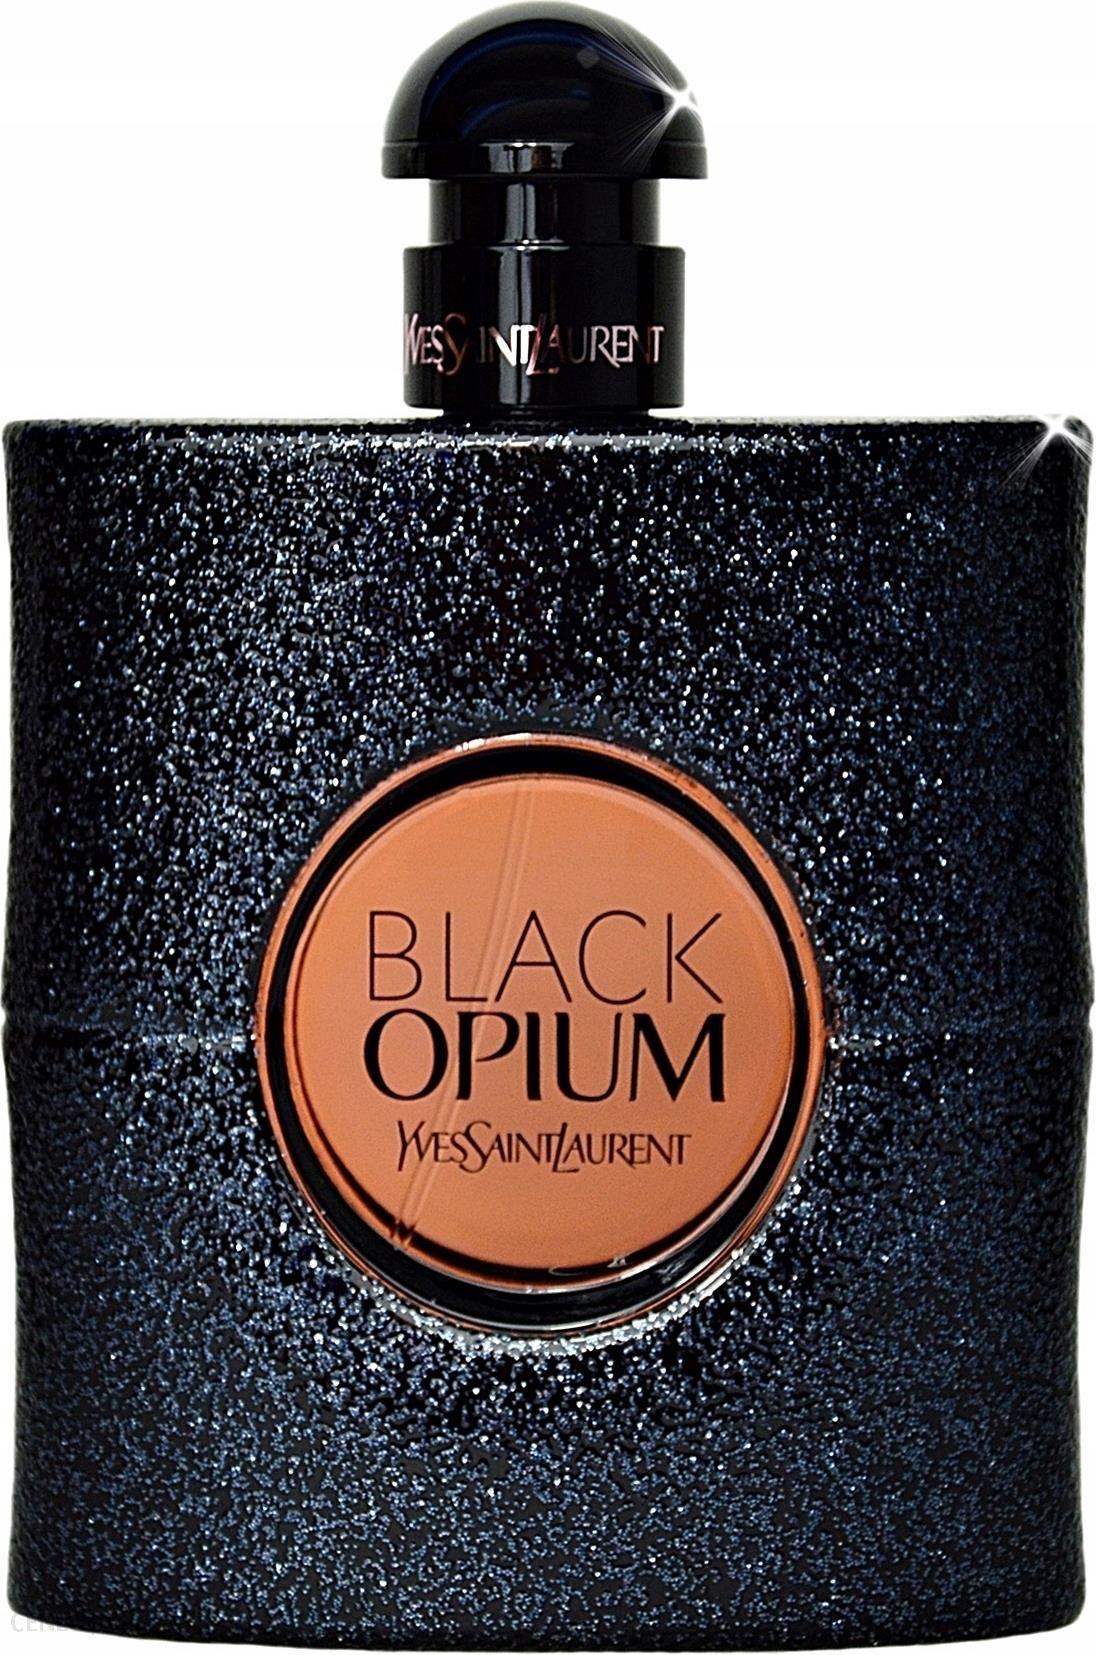 51c217c791c1 Perfumy Yves Saint Laurent Black Opium Floral Shock Woda Perfumowana 90ml -  zdjęcie 1